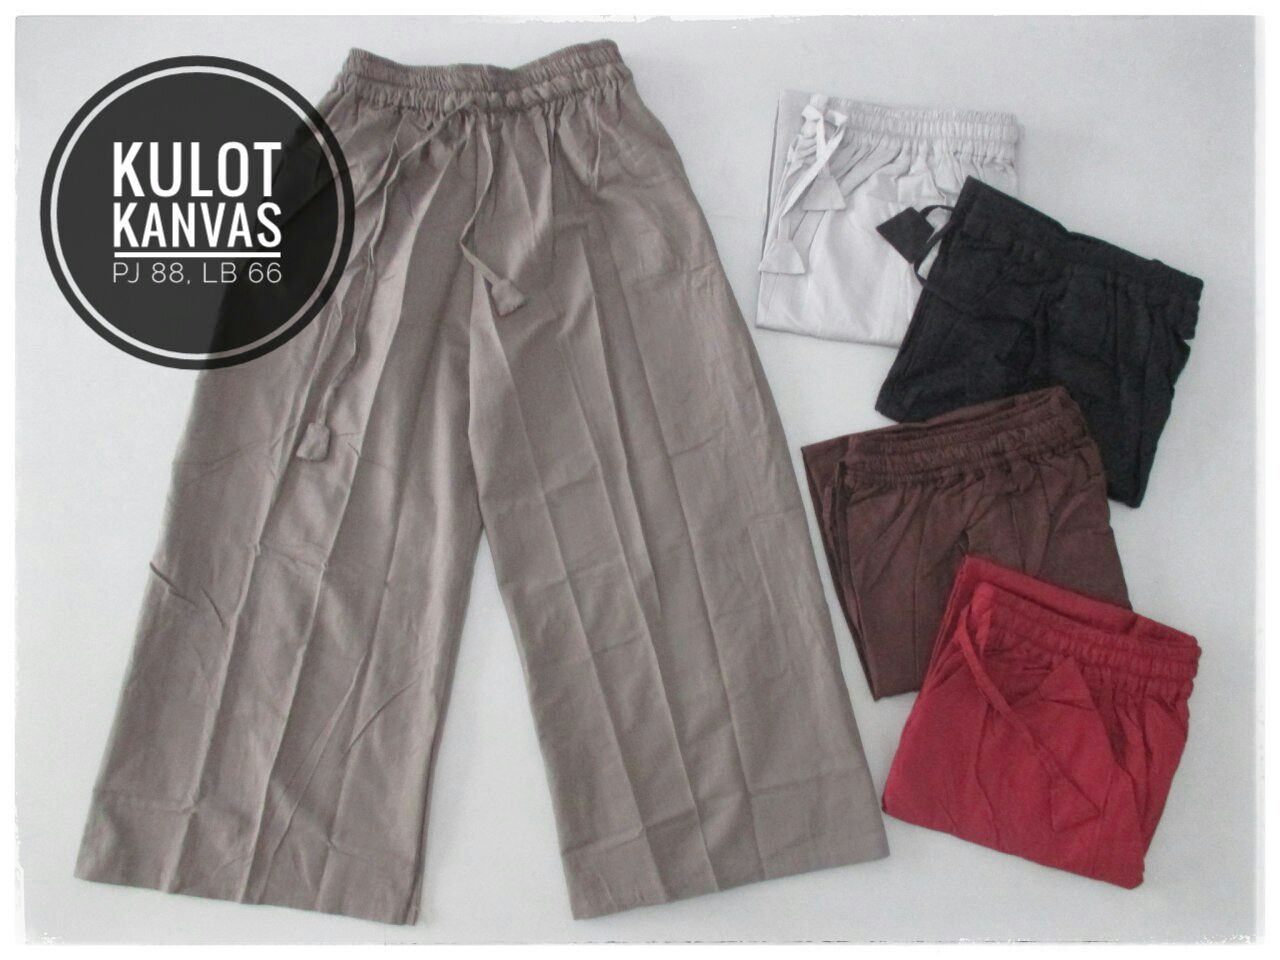 ObralanBaju.com Obral Baju Pakaian Murah Meriah 5000 Celana Kulot Kanvas